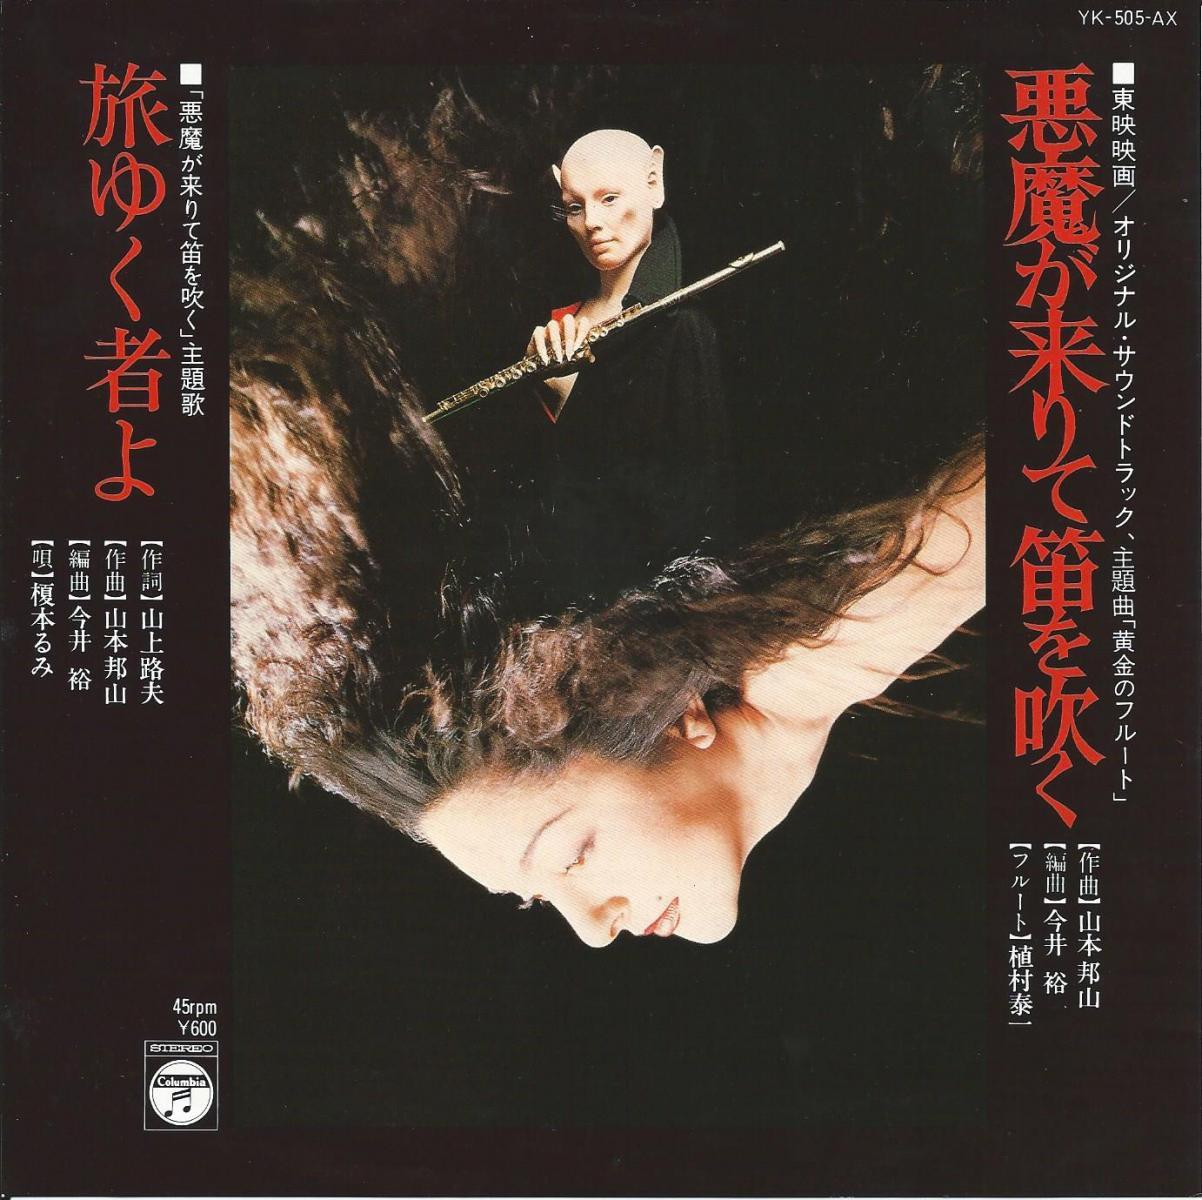 O.S.T.(山本邦山 HOZAN YAMAMOTO,今井裕 YUTAKA IMAI 植村泰一) / 悪魔が来りて笛を吹く (7